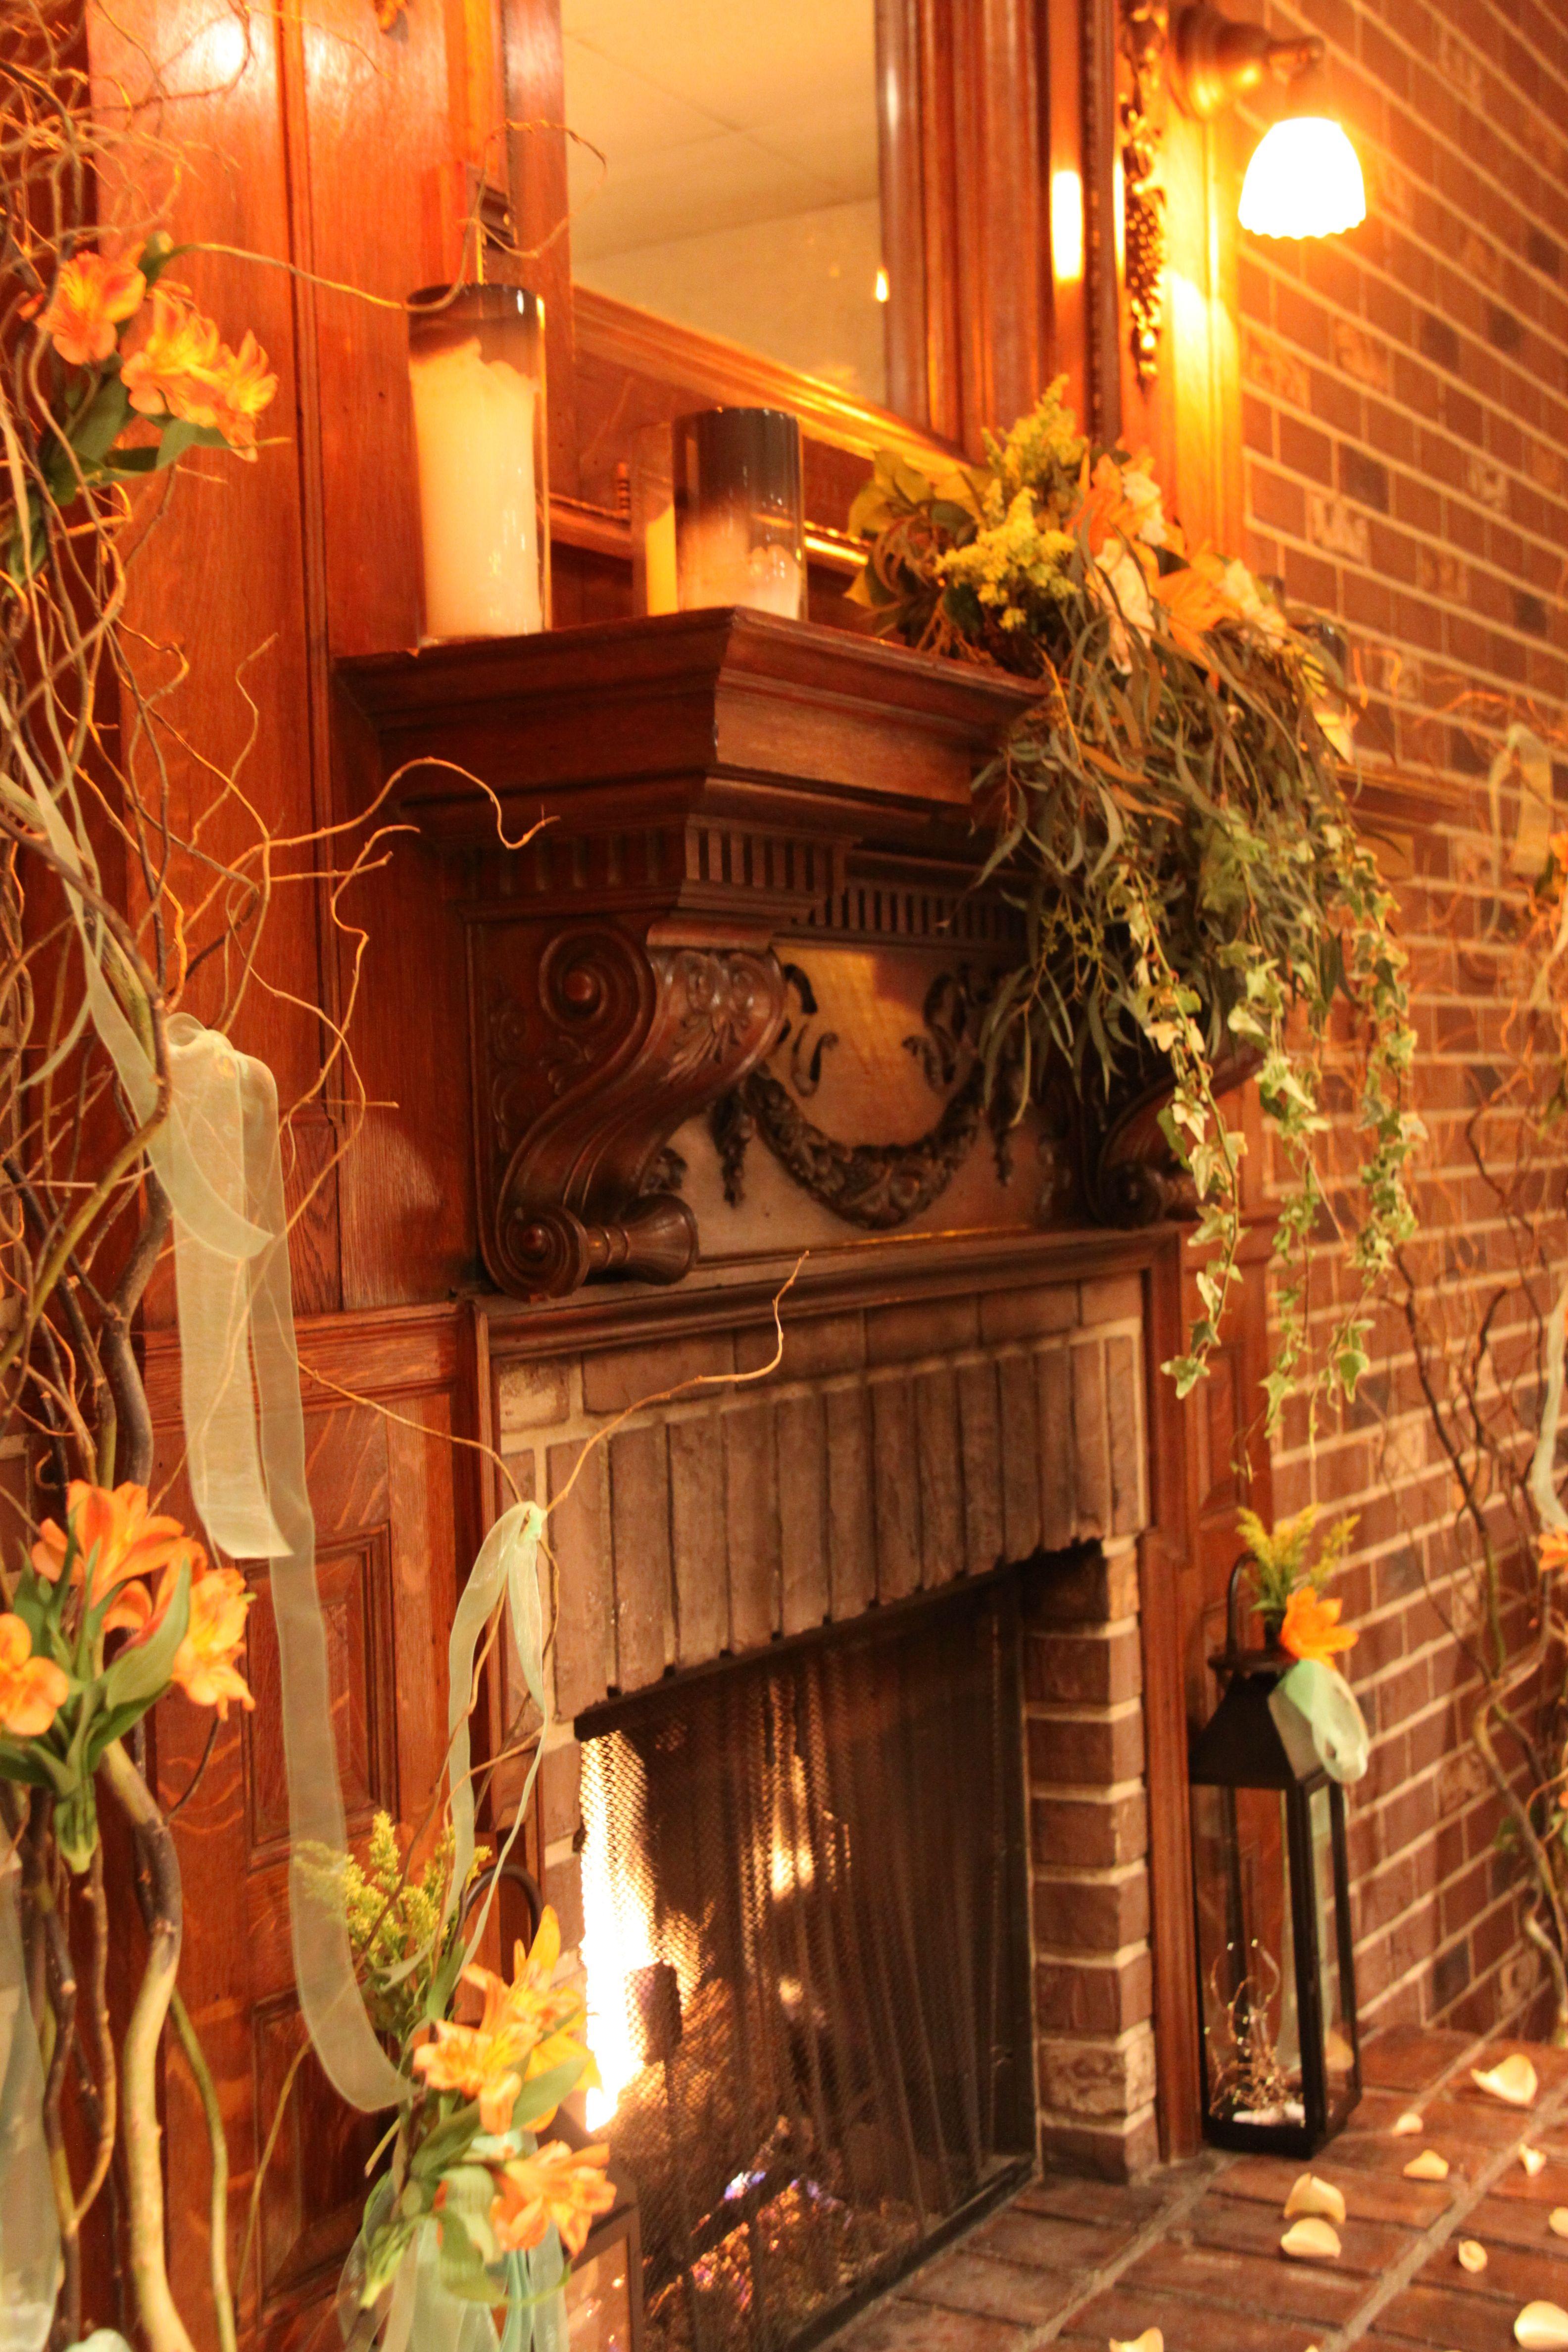 Fireplace Decorations | Fireplace, Decor, Fireplace decor